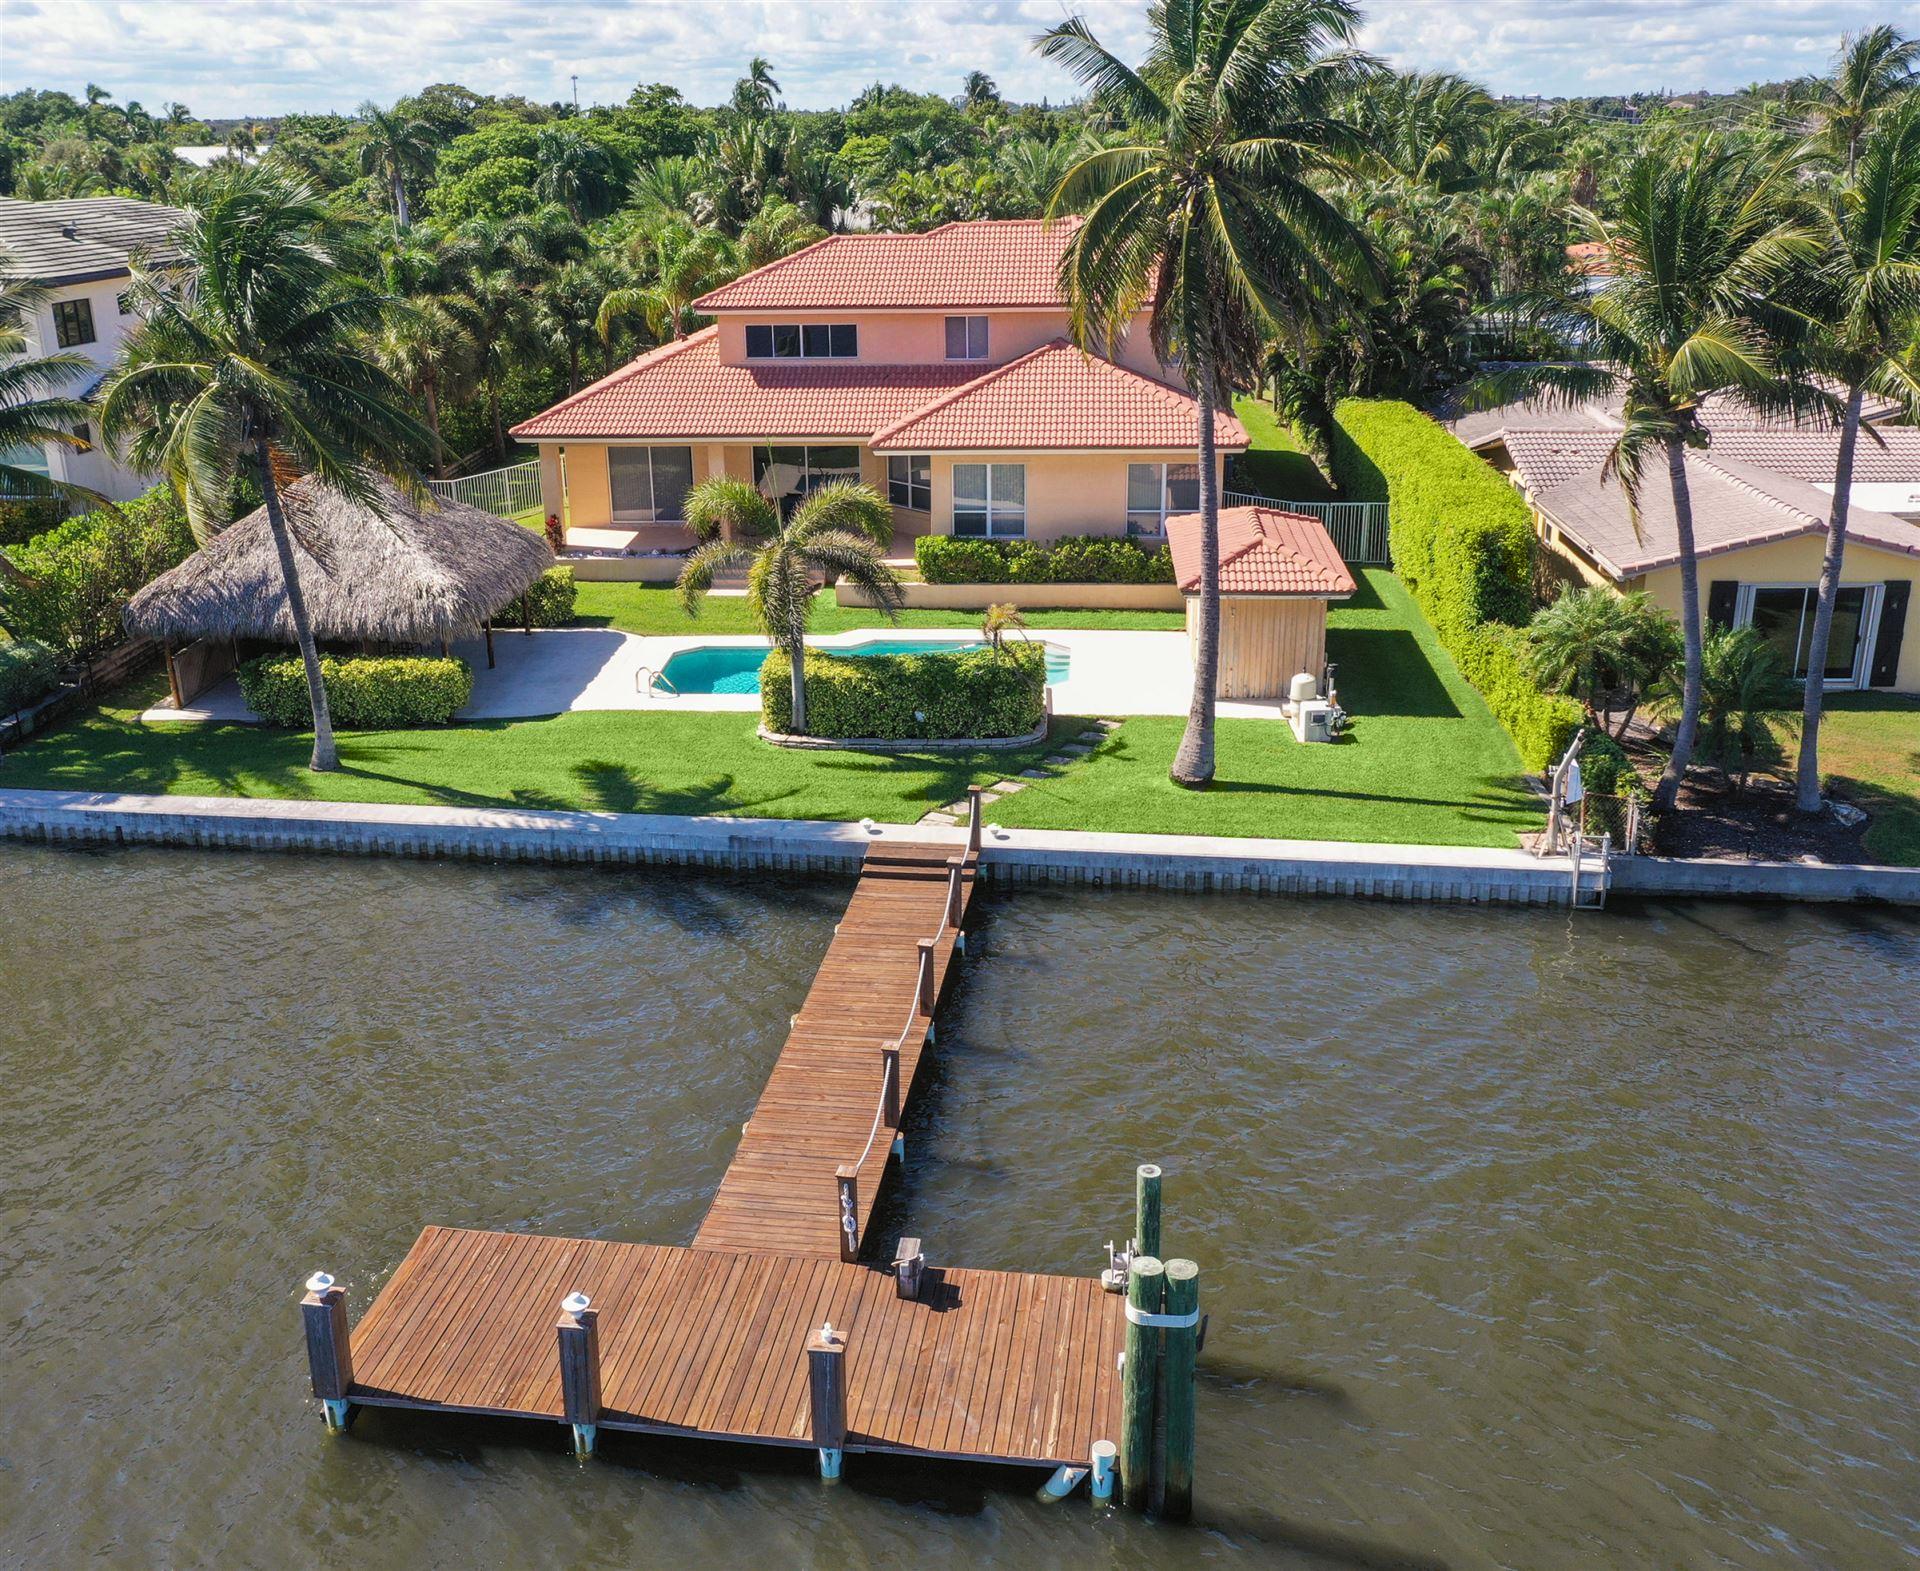 HYPOLUXO ISLAND Properties For Sale